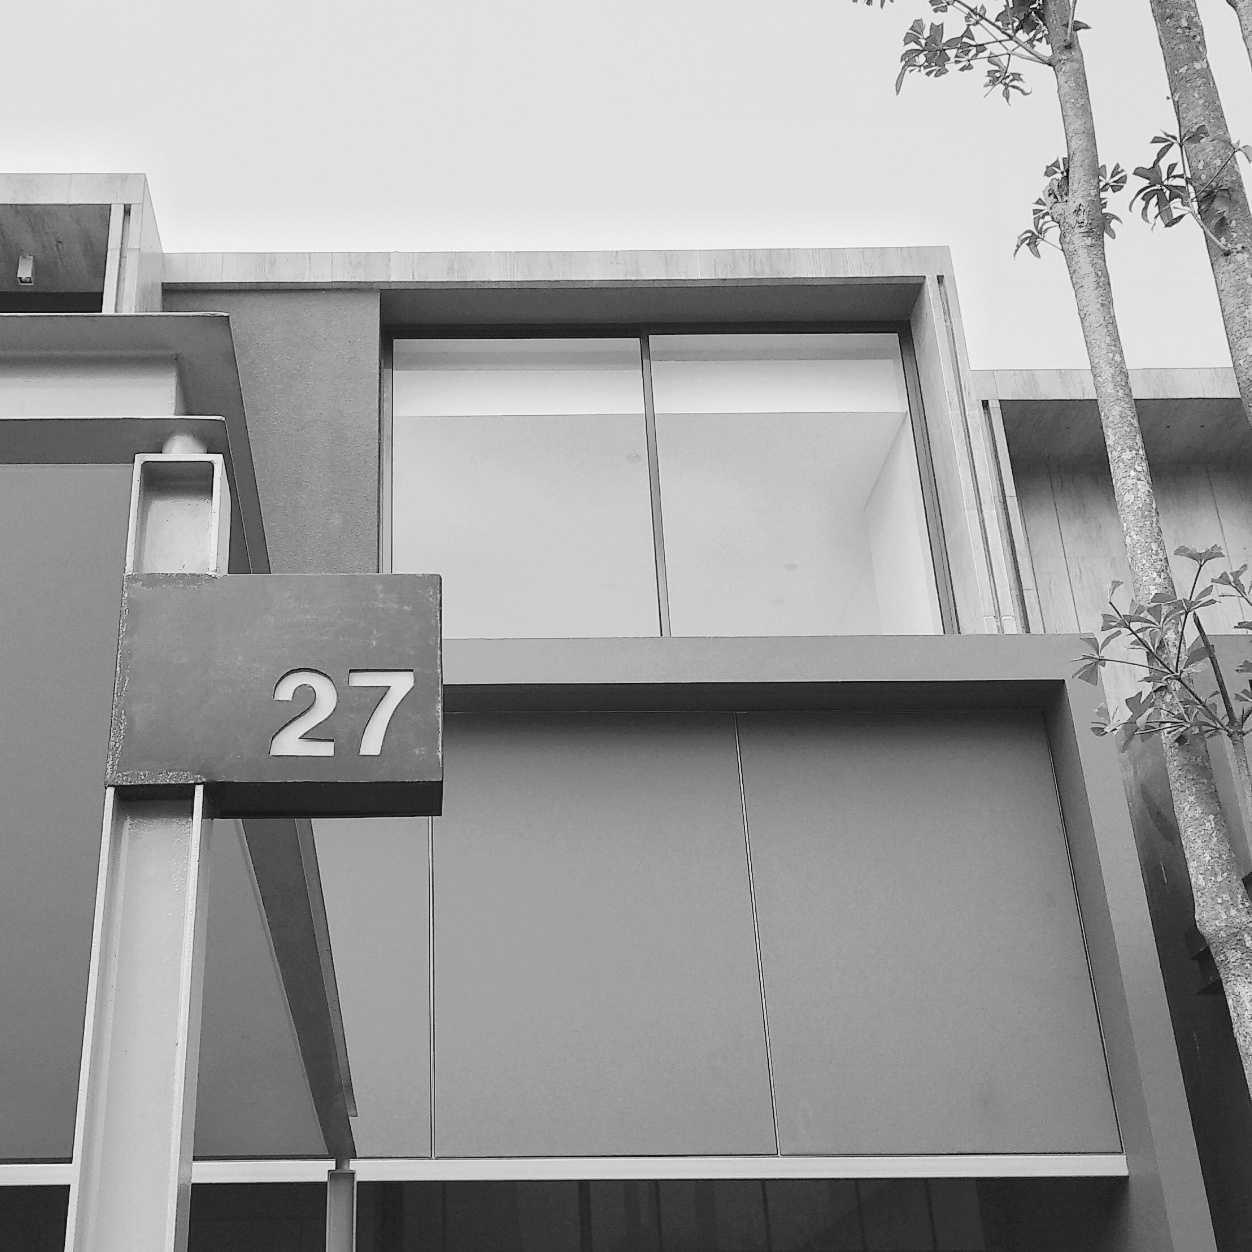 Studio Saya Aei27 House Renovation Jl. Jalur Sutera, Kunciran, Pinang, Kota Tangerang, Banten 15143, Indonesia Jl. Jalur Sutera, Kunciran, Pinang, Kota Tangerang, Banten 15143, Indonesia Studio-S-A-Y-A-Aei27-House-Renovation  60994